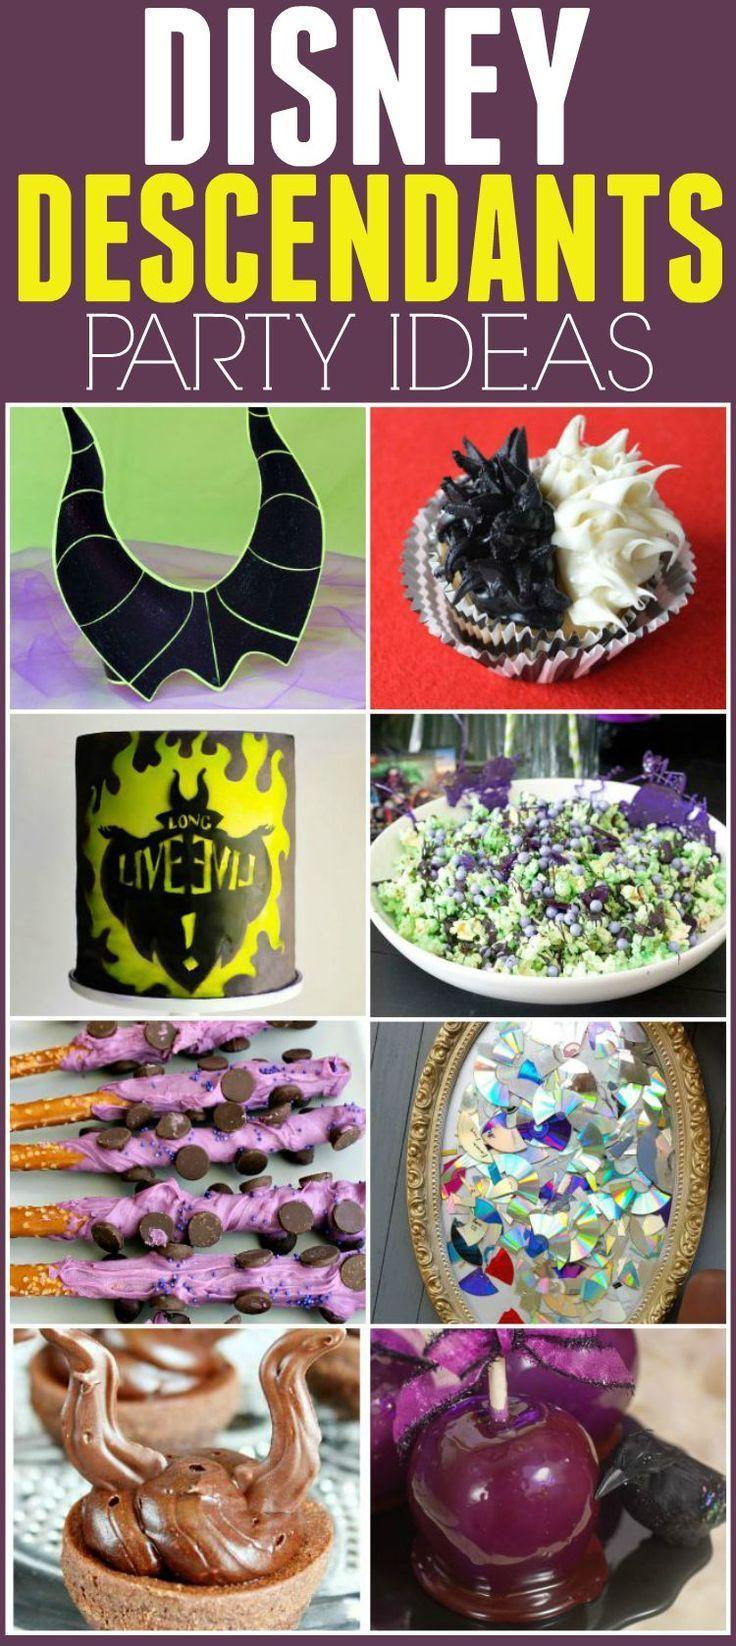 253 best Disney's Maleficent Parties! images on Pinterest